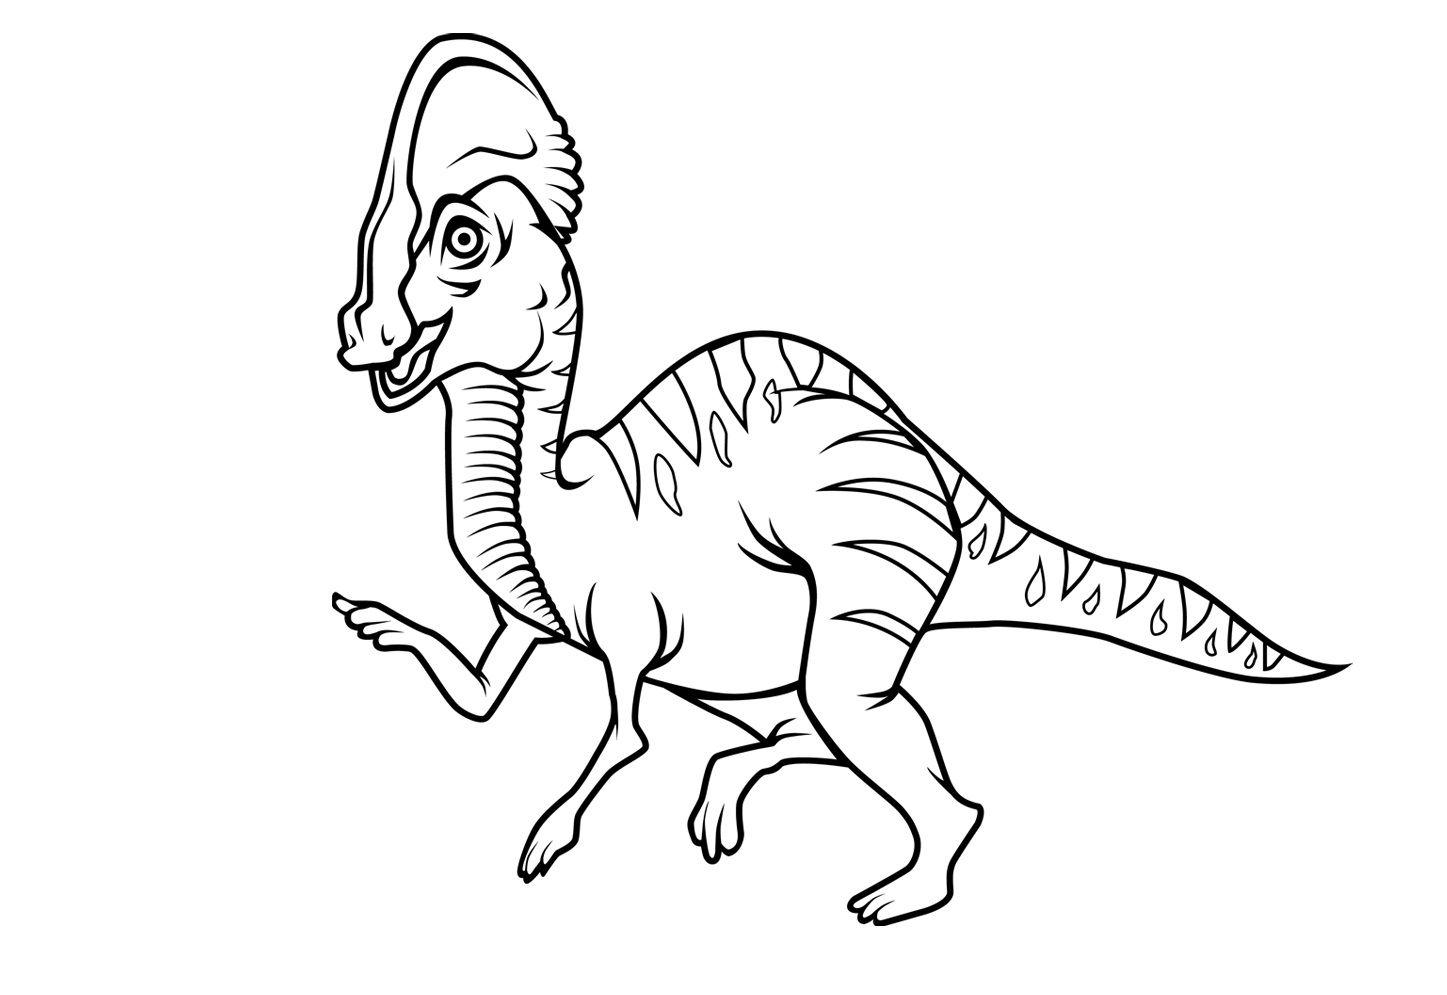 Dinosaur Corythosaurus | Dinosaurs | Pinterest